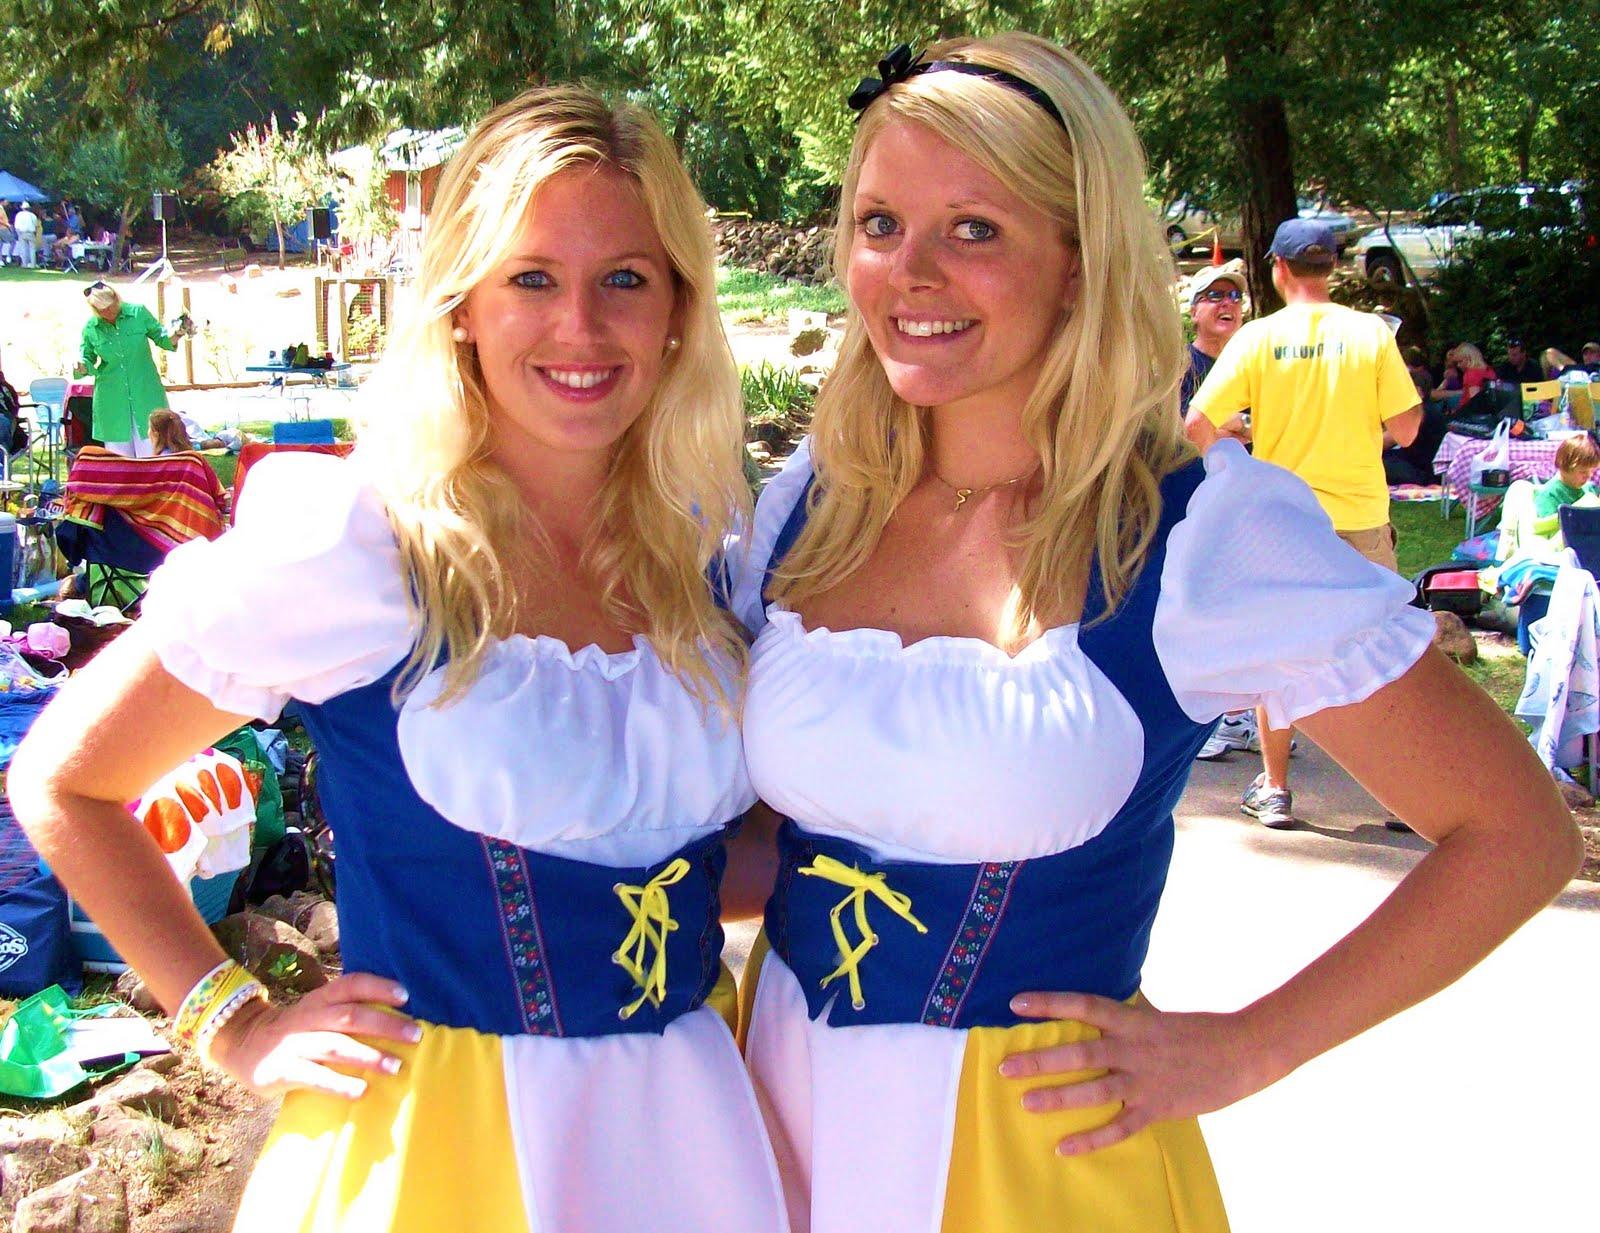 482e5ca238c Party Queen - Blogg: Sverigeklänning